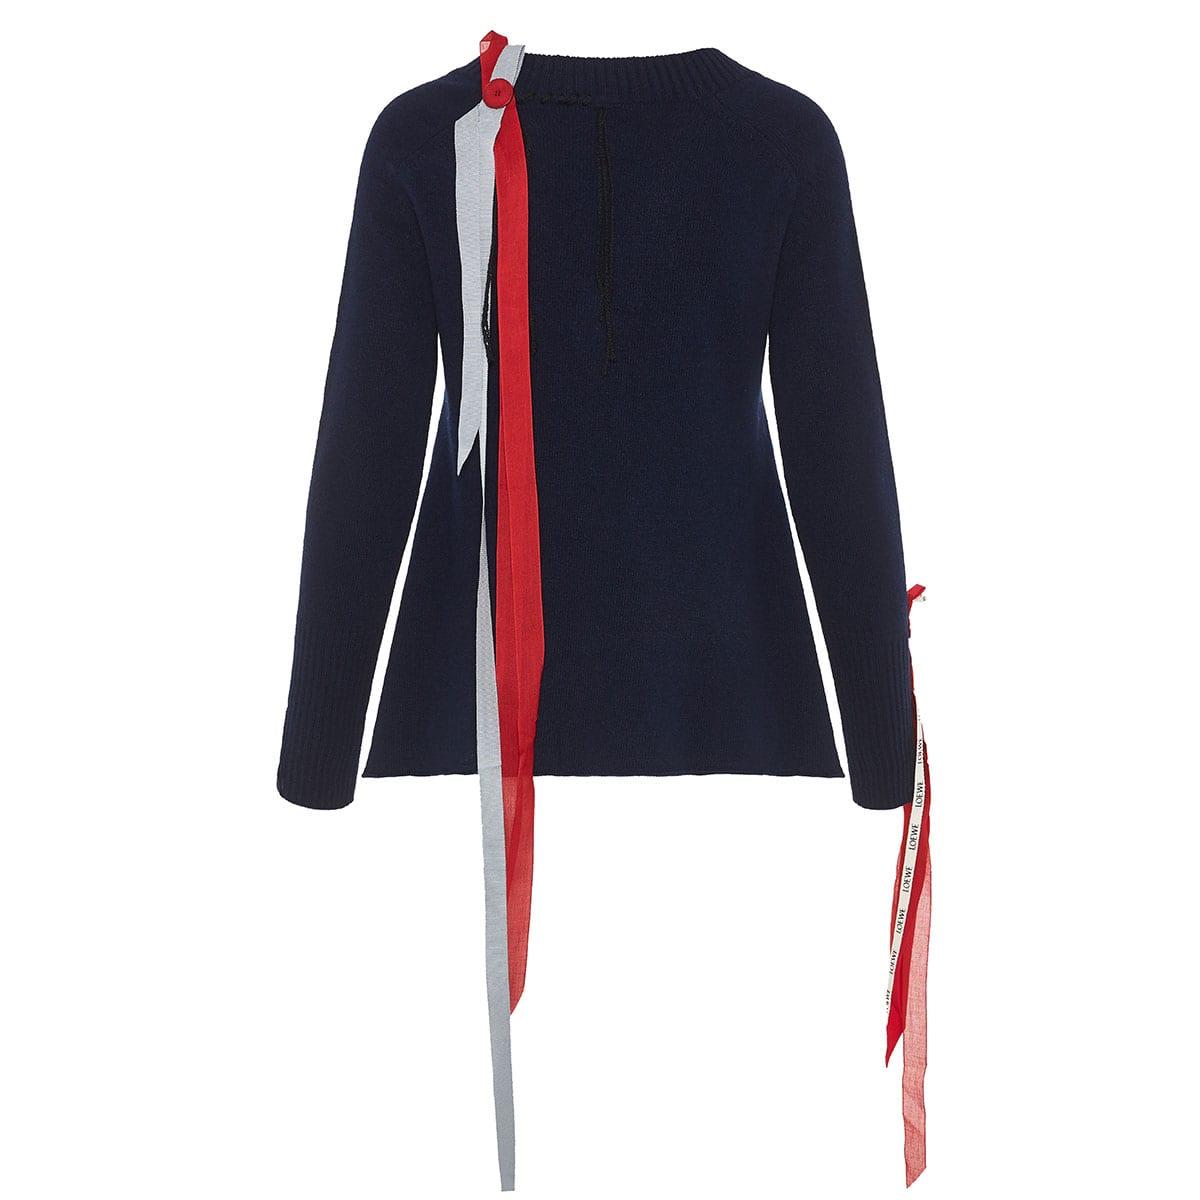 Ribbon-embellished wool sweater